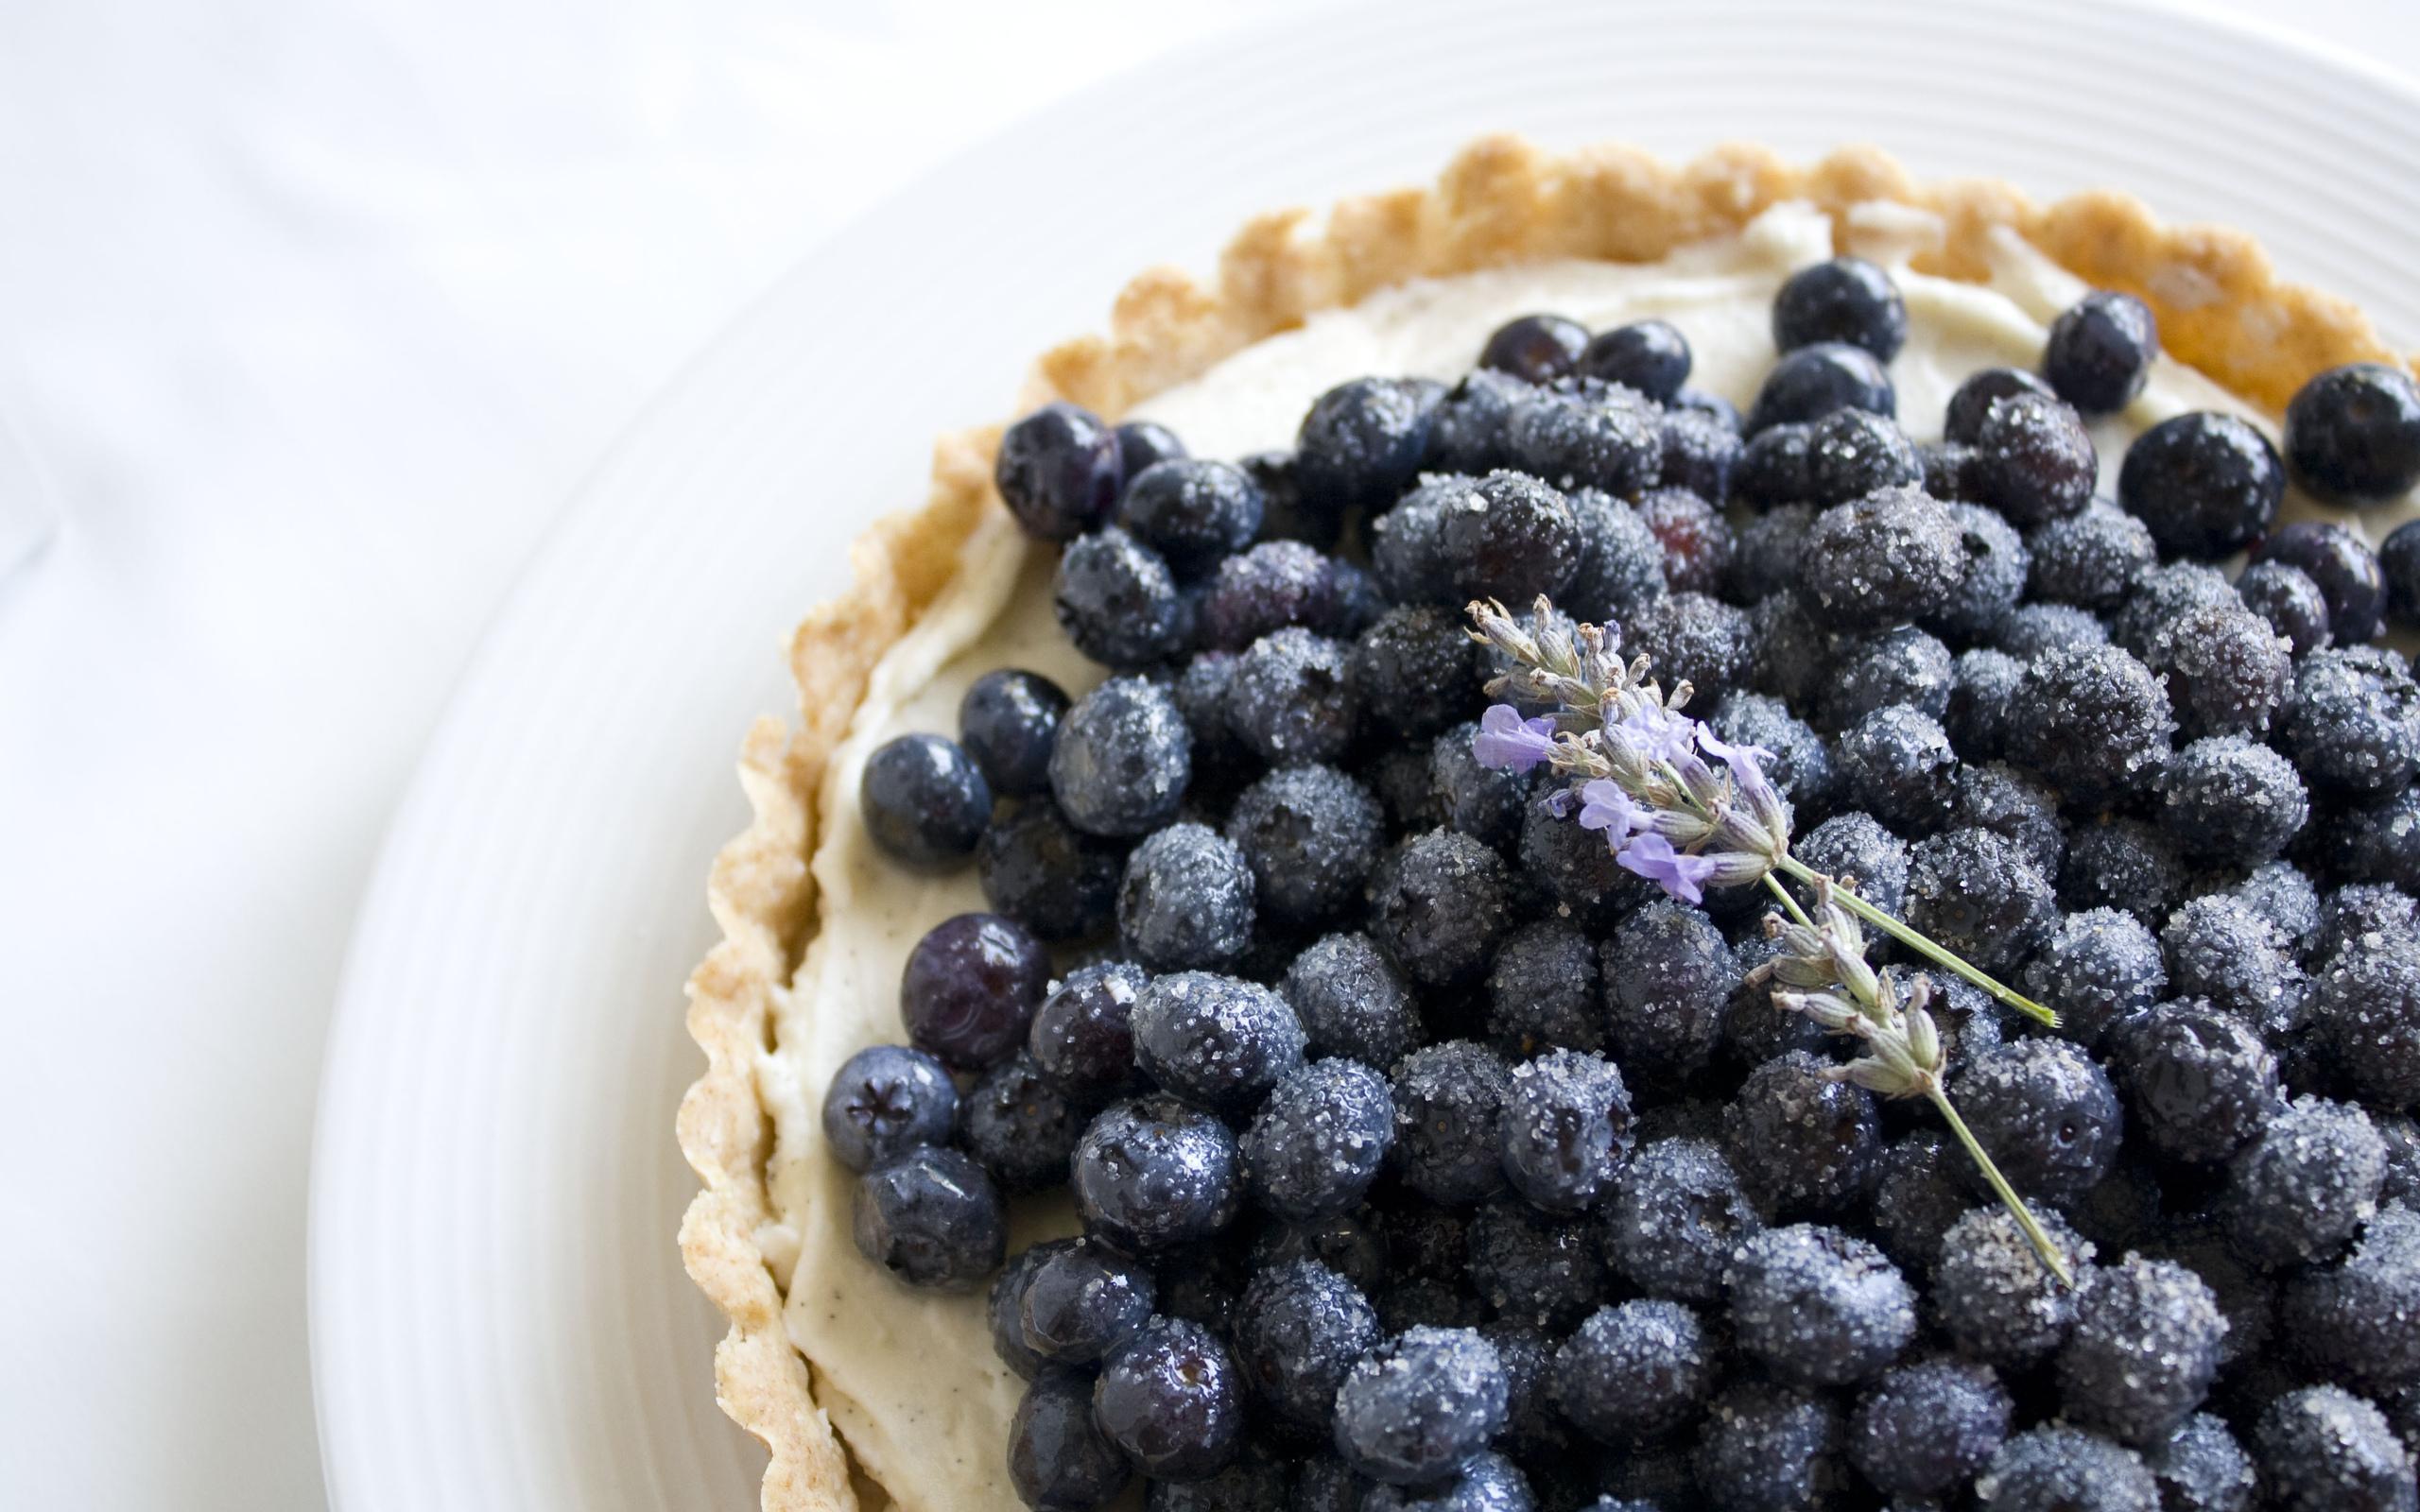 Beautiful Blueberry Wallpaper